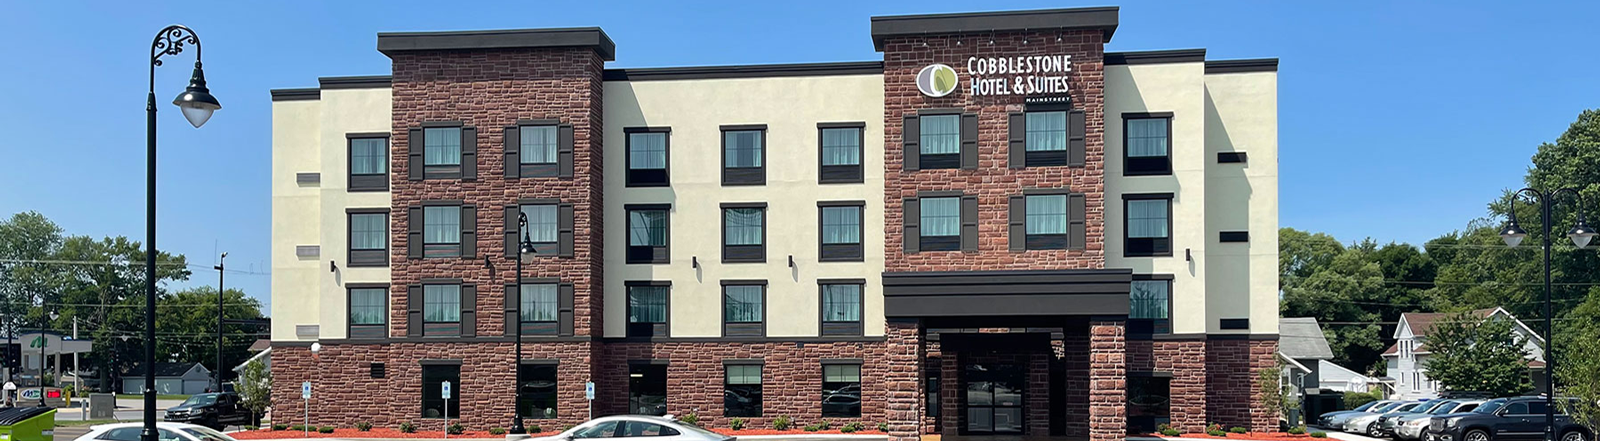 Cobblestone Hotel & Suites Main Street Little Chute